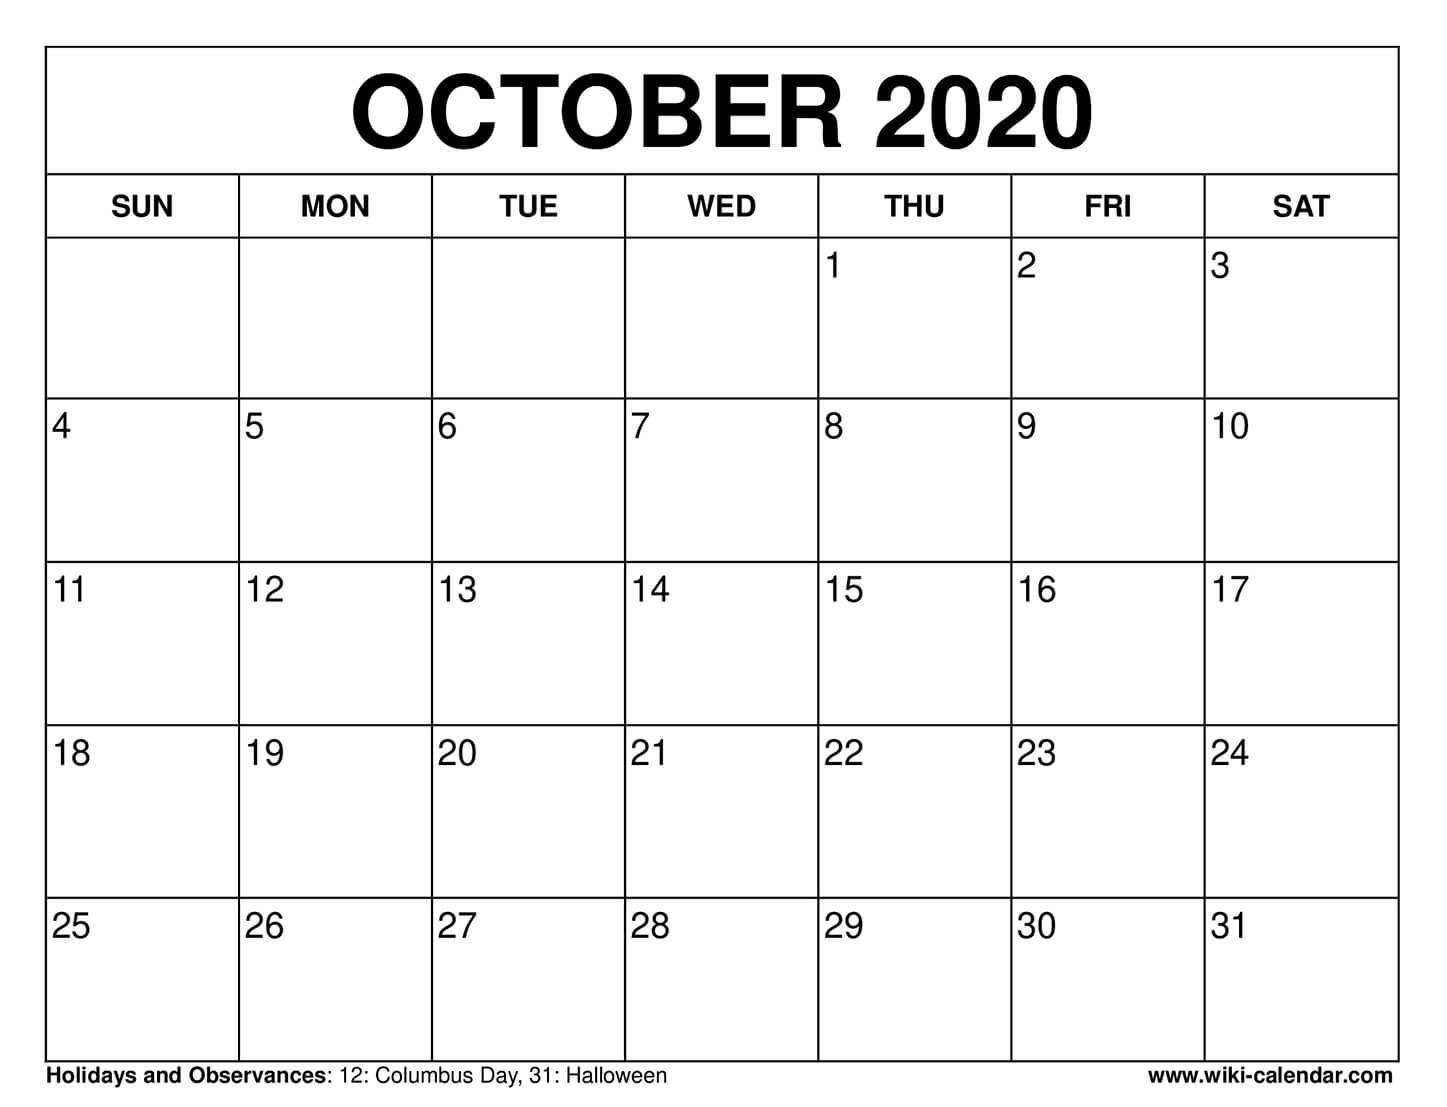 Free Printable October 2020 Calendars General Blue August 2021 Calendar